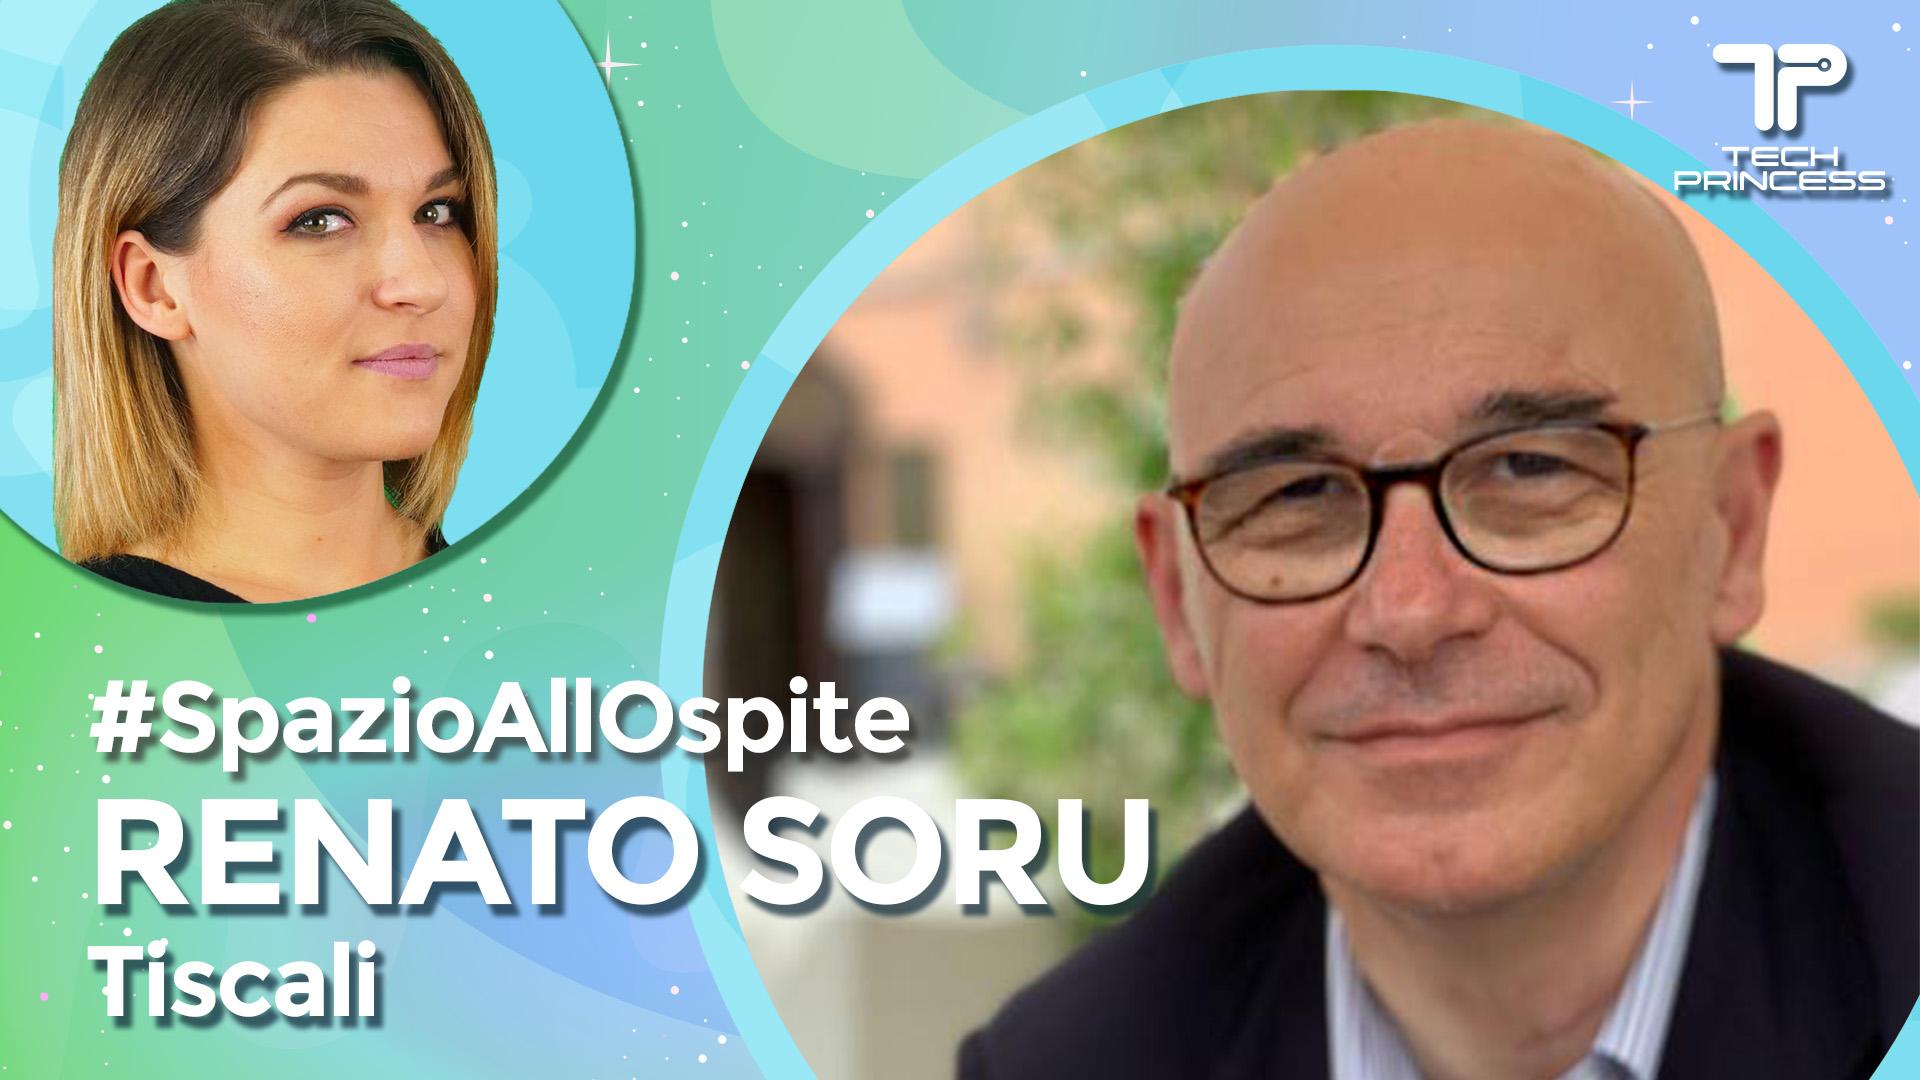 Renato Soru, Tiscali: la grande impresa italiana | Intervista in live #SpazioAllOspite thumbnail